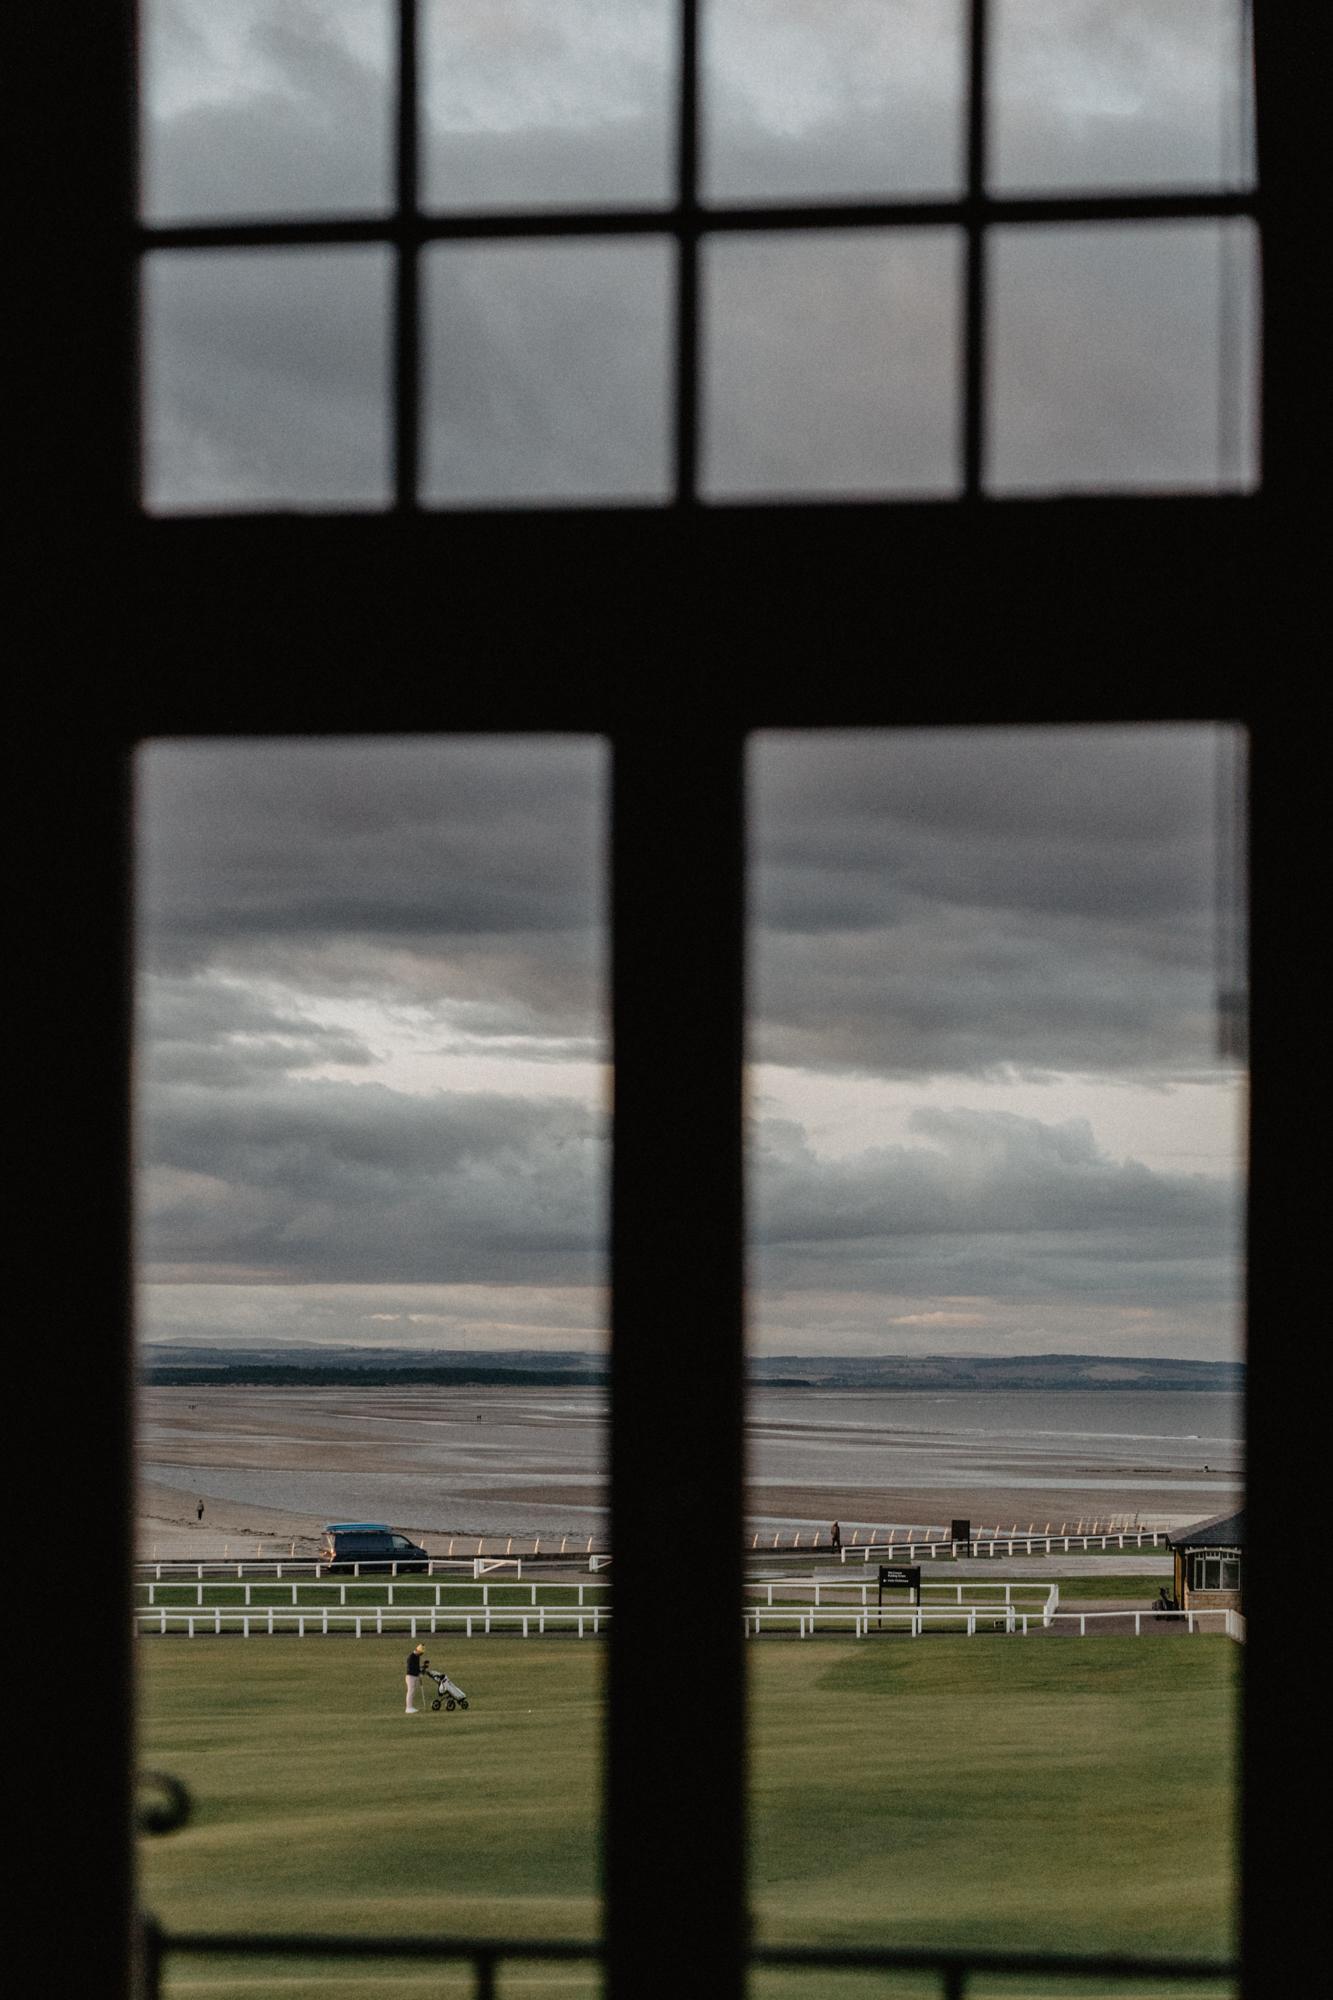 Scotland_OldCourse-02893.jpg